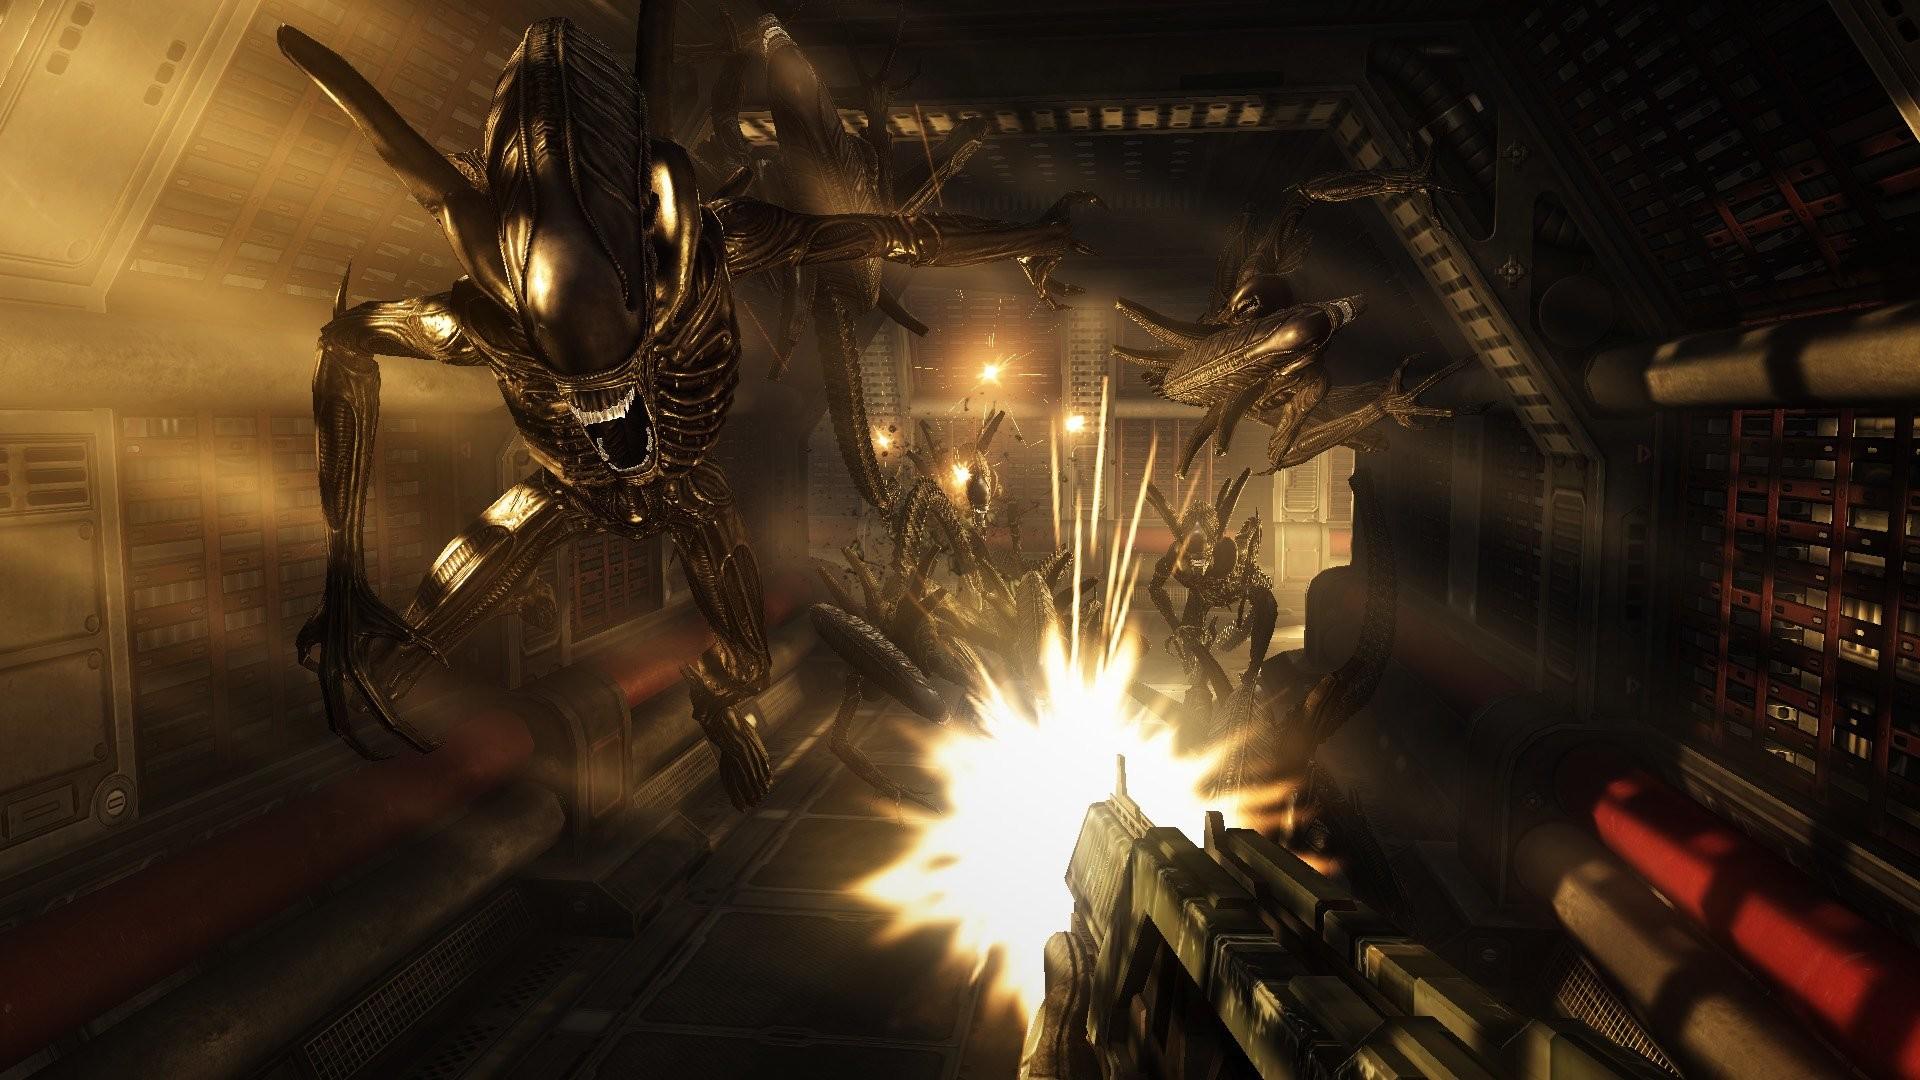 Video Game – Aliens: Colonial Marines Alien Wallpaper